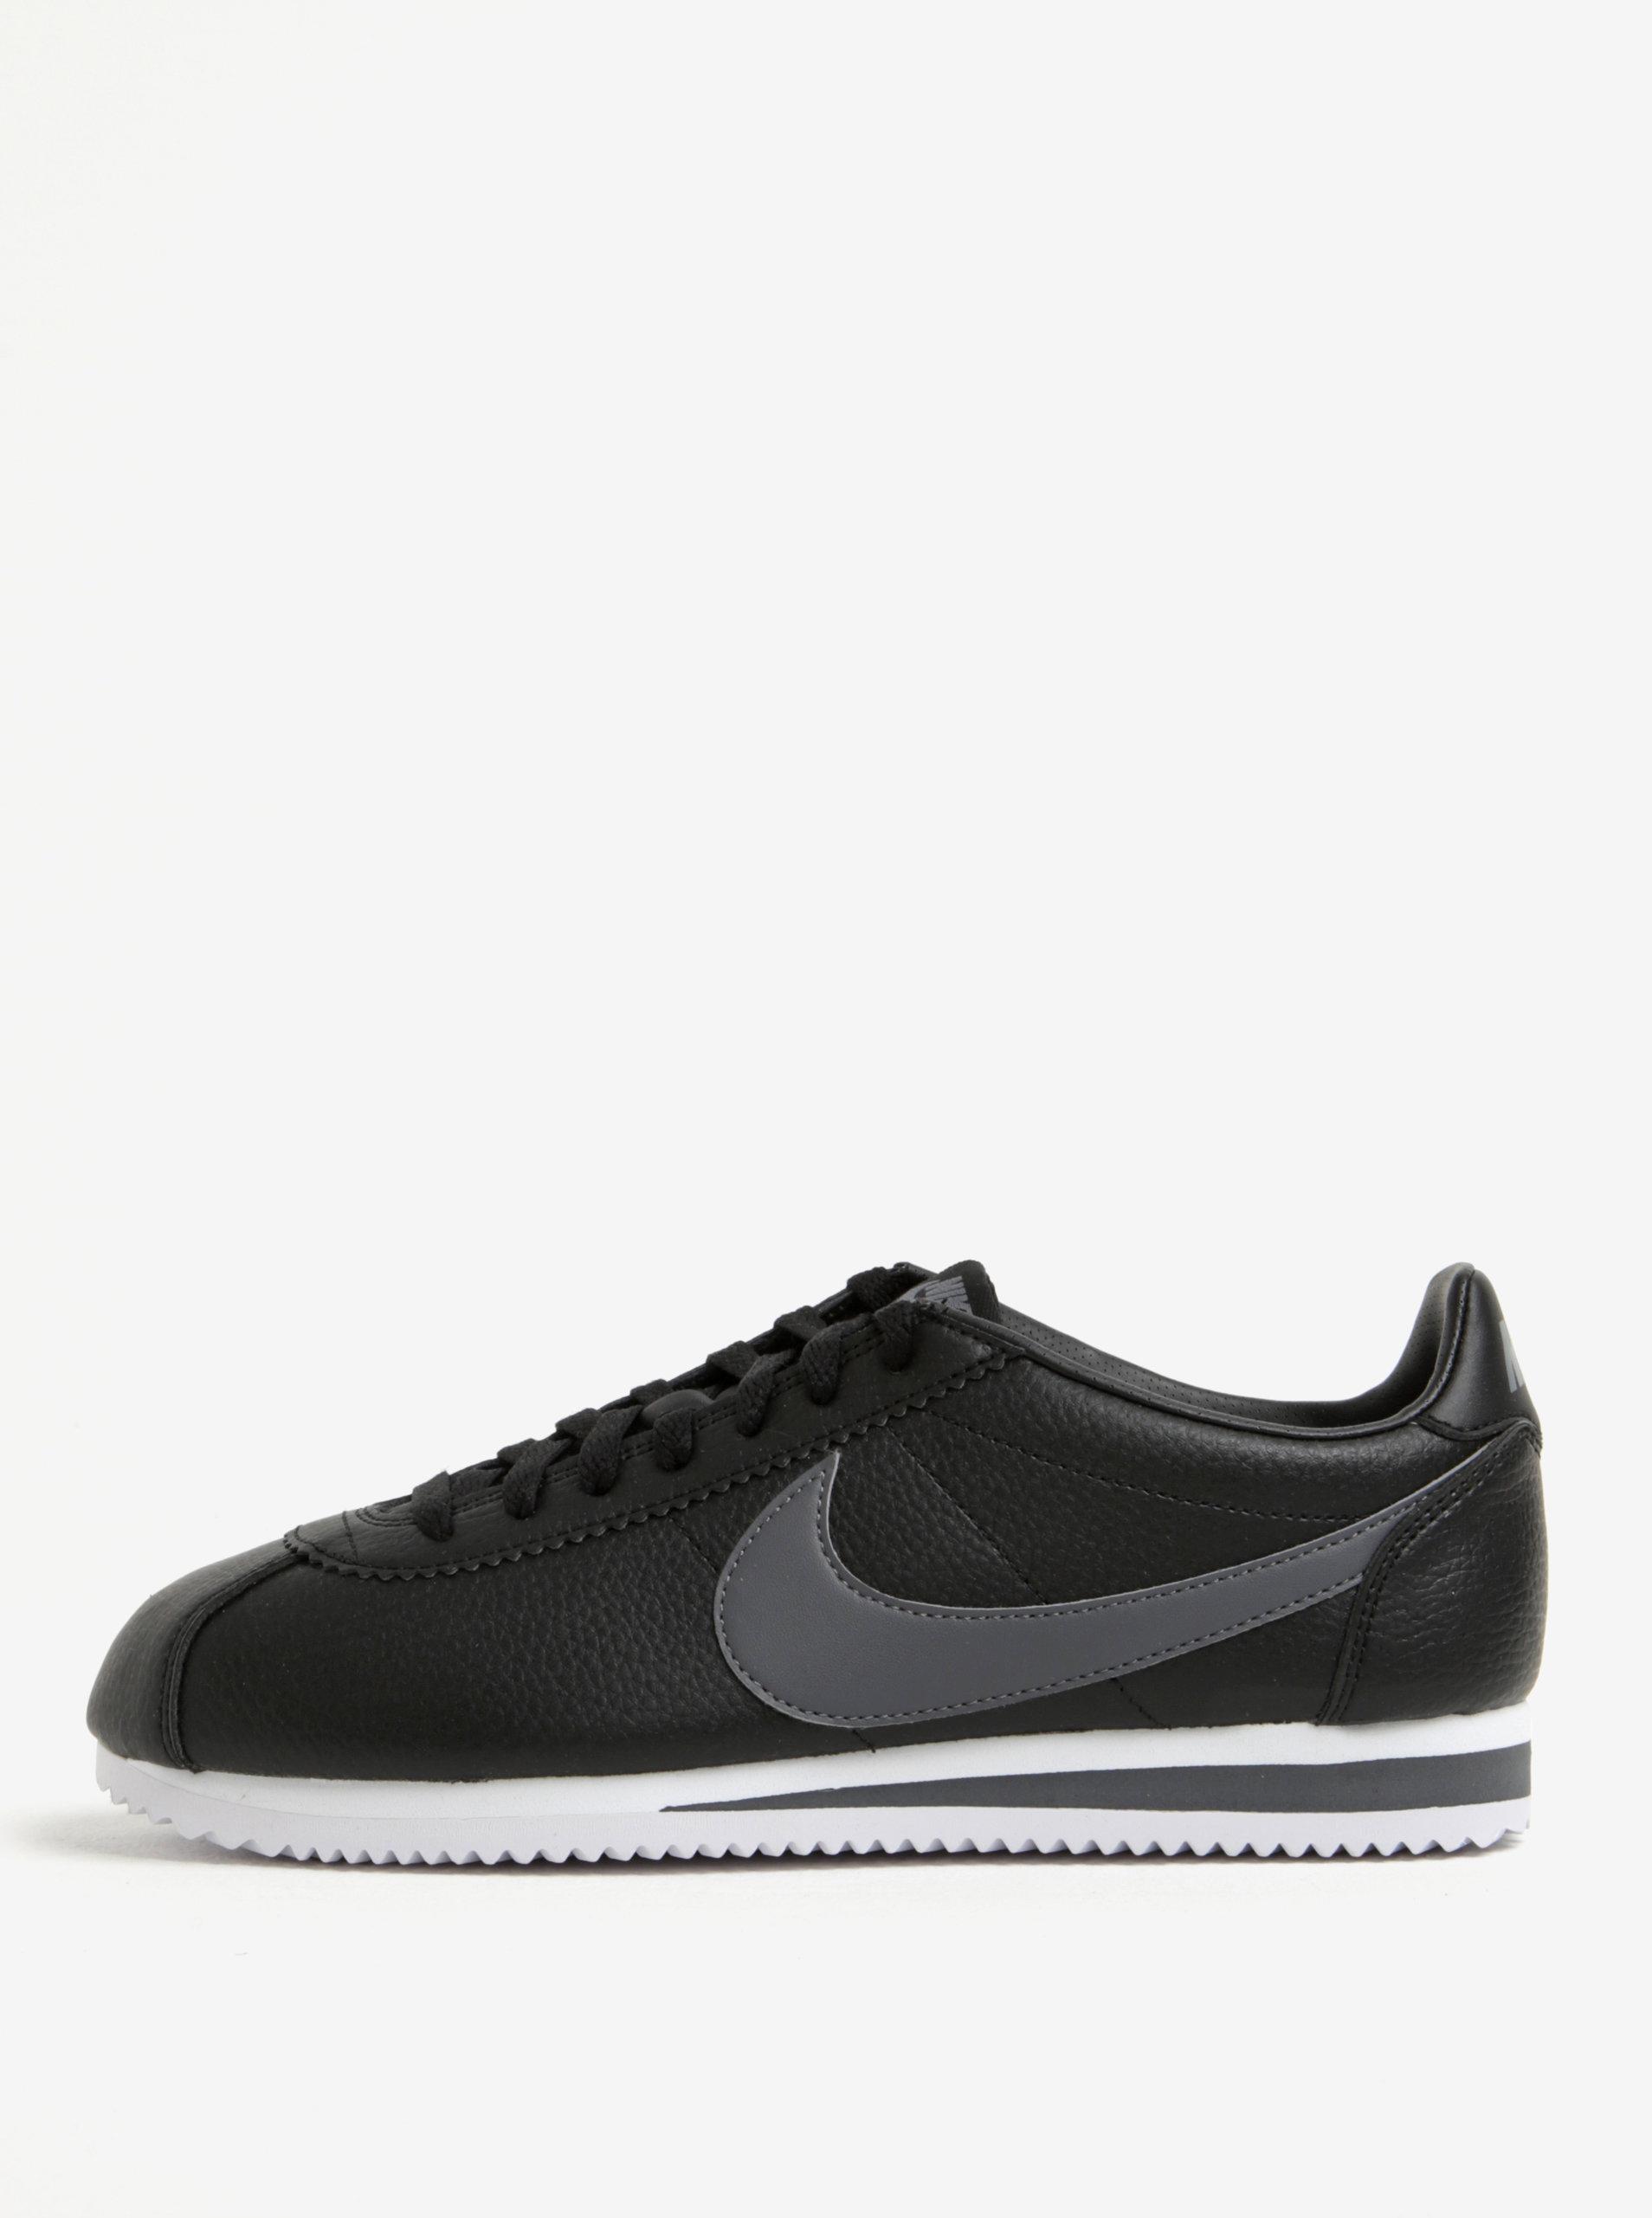 0a1ceffe8a0 Černé pánské kožené tenisky Nike Classic Cortez ...